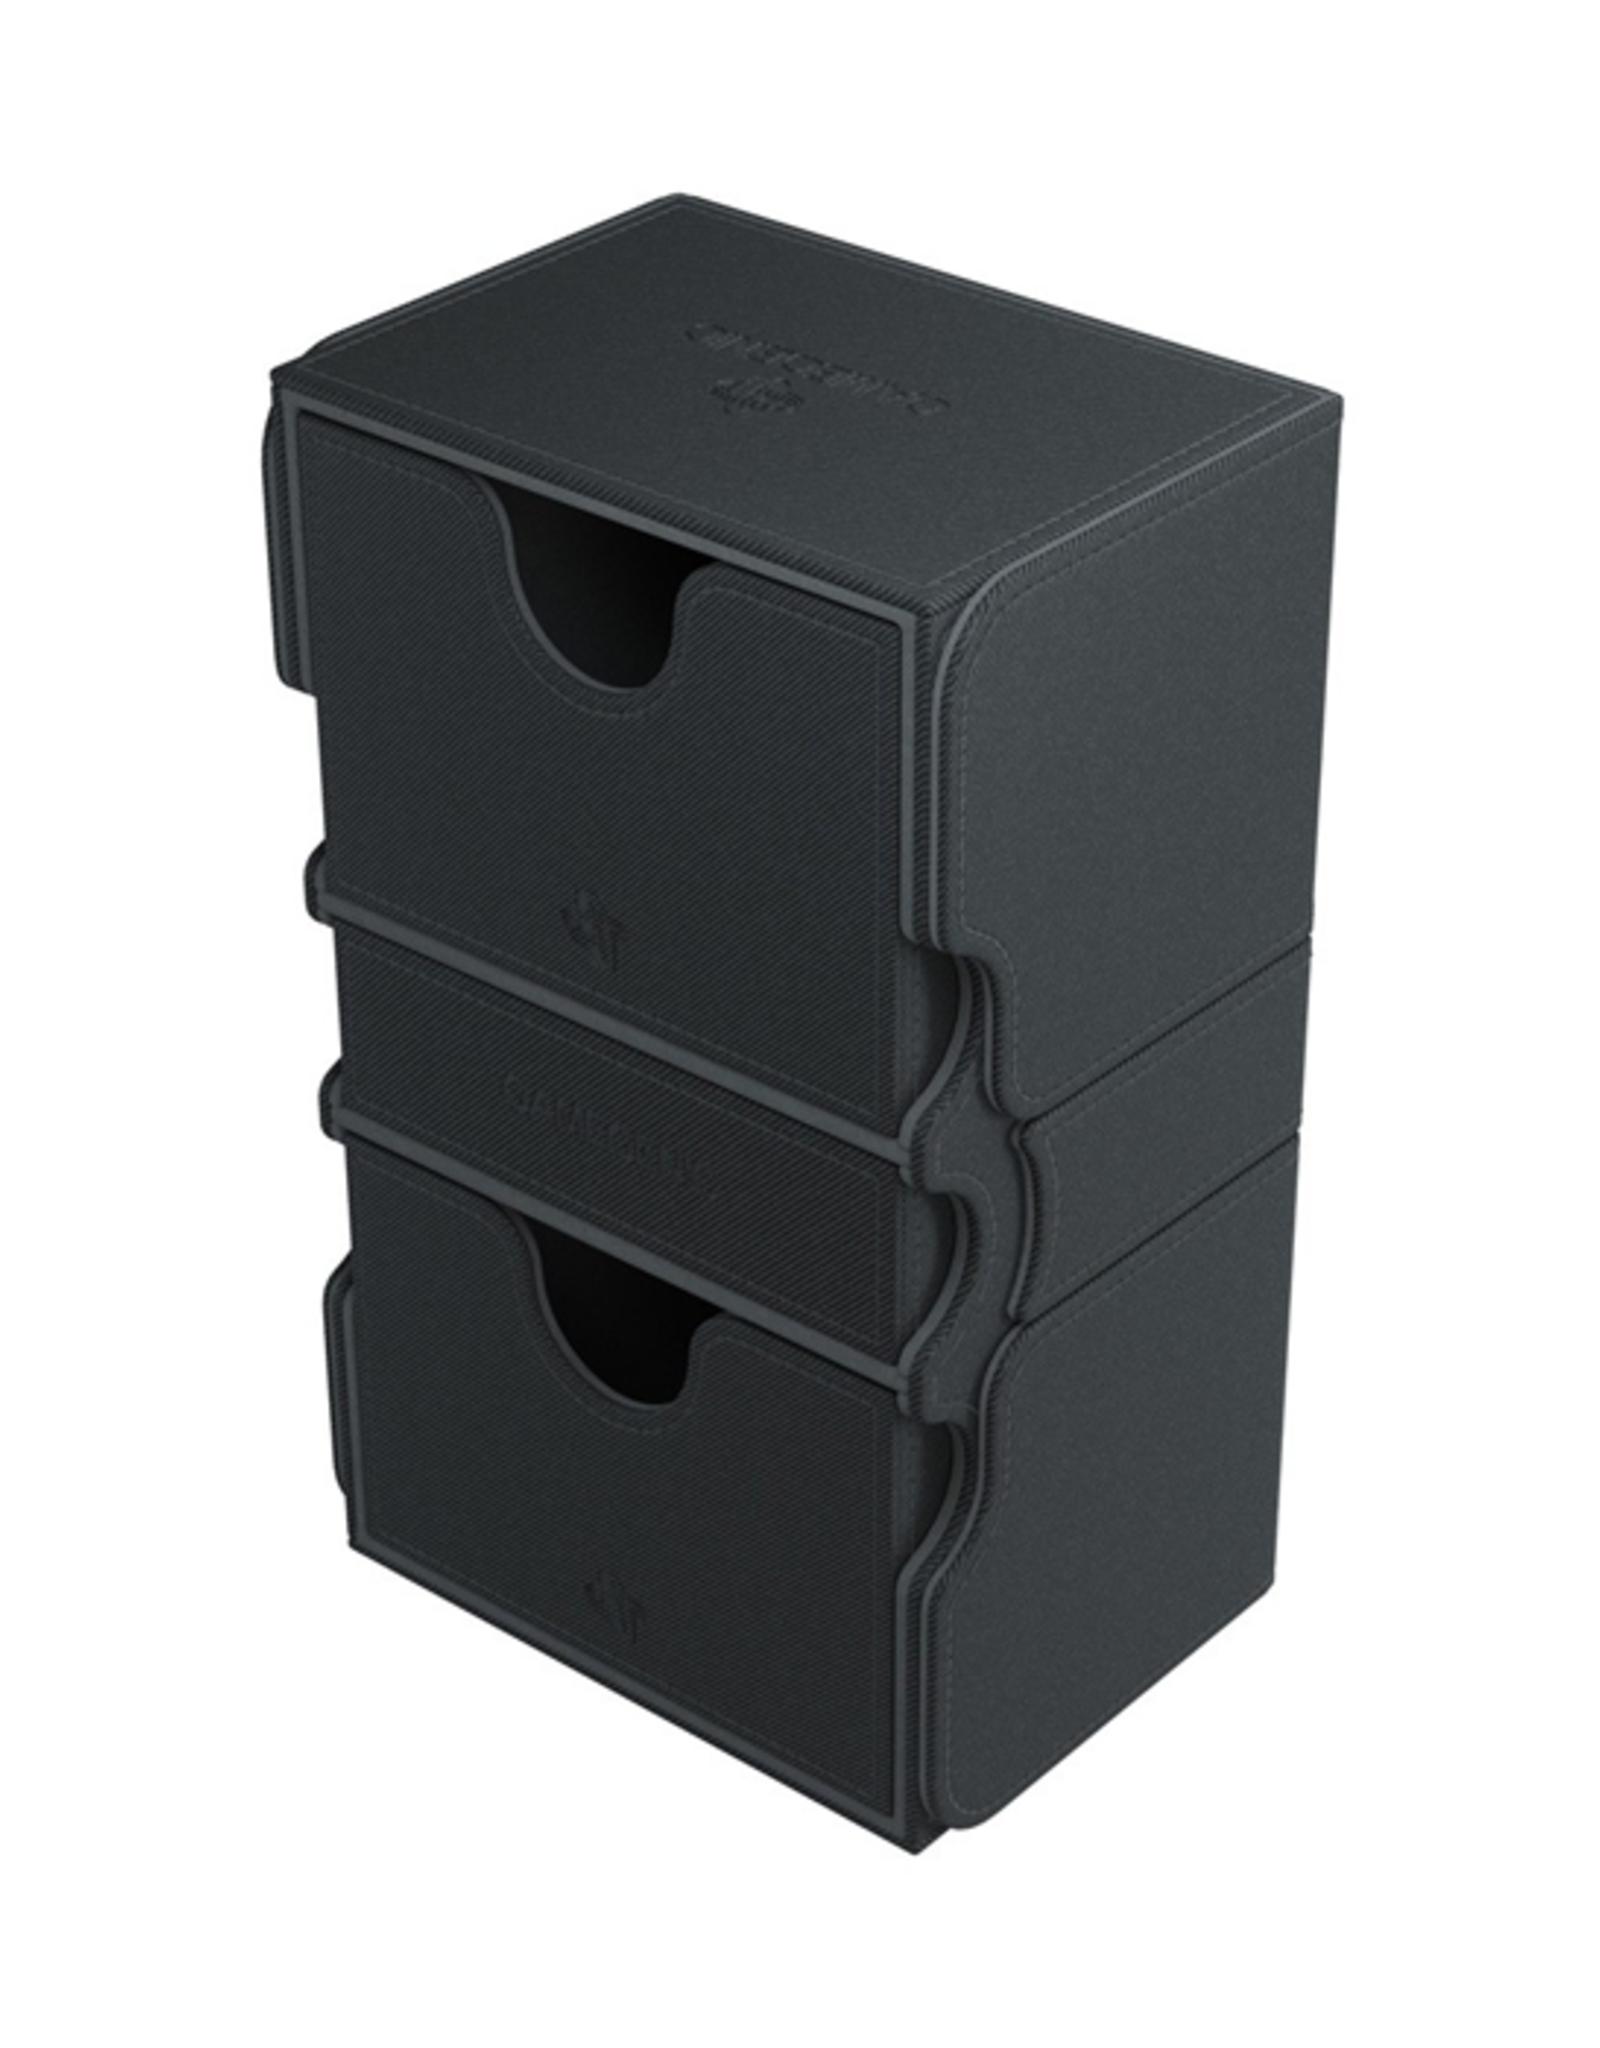 Gamegenic Gamegenic: Deck Box - Stronghold 200+ - Black